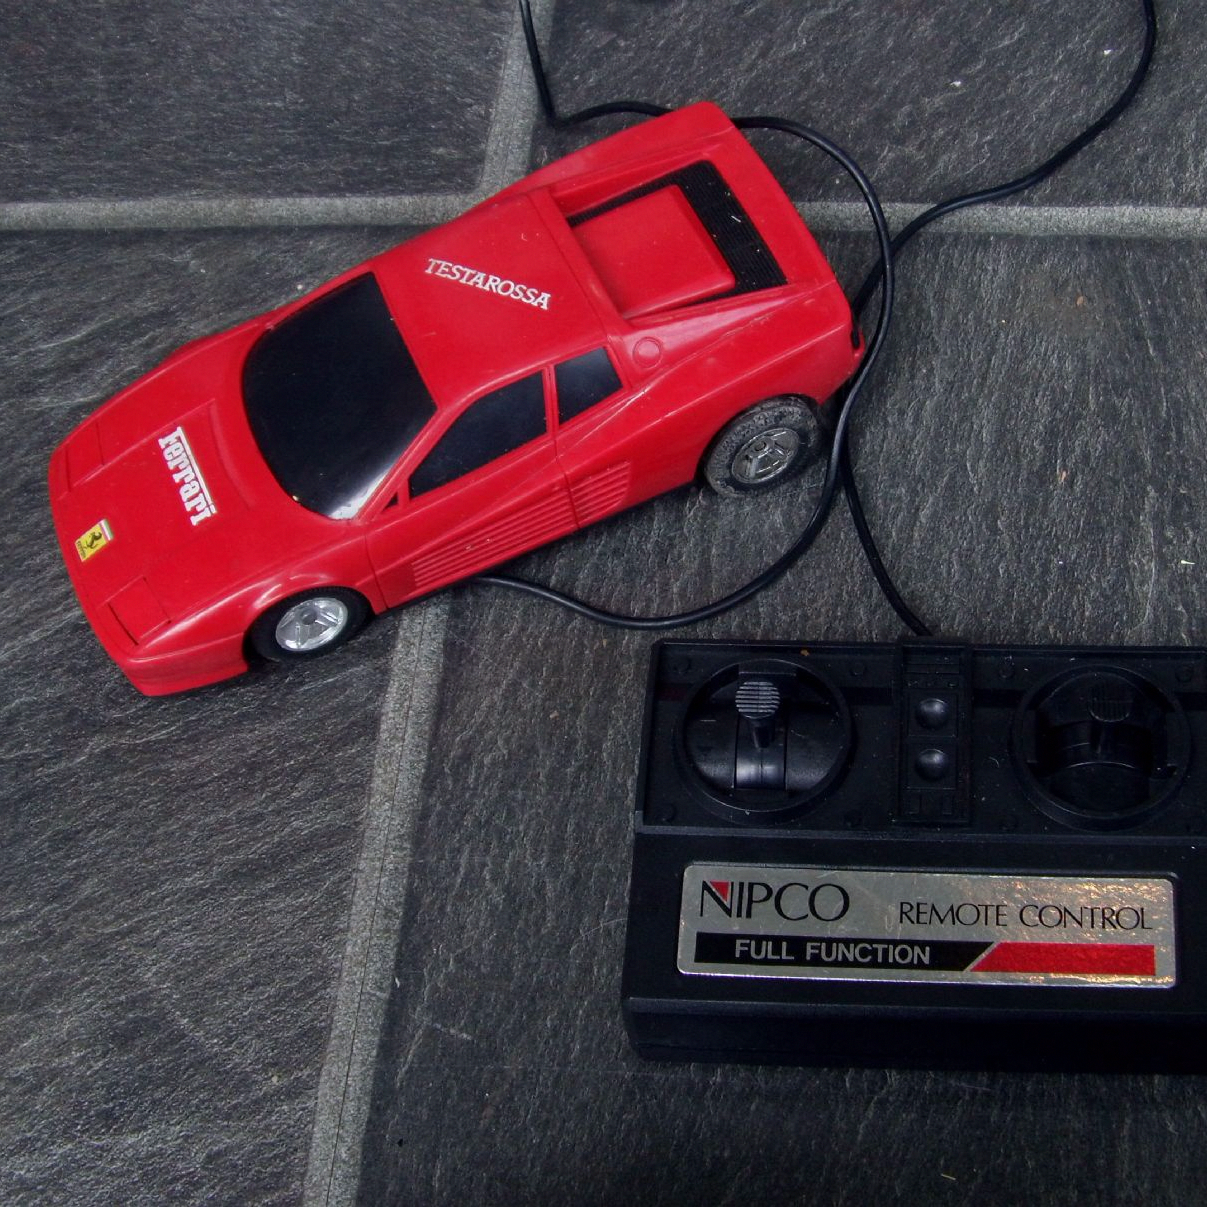 ITEM very nice Retro toy of a Ferrari Testarossa 80 s type